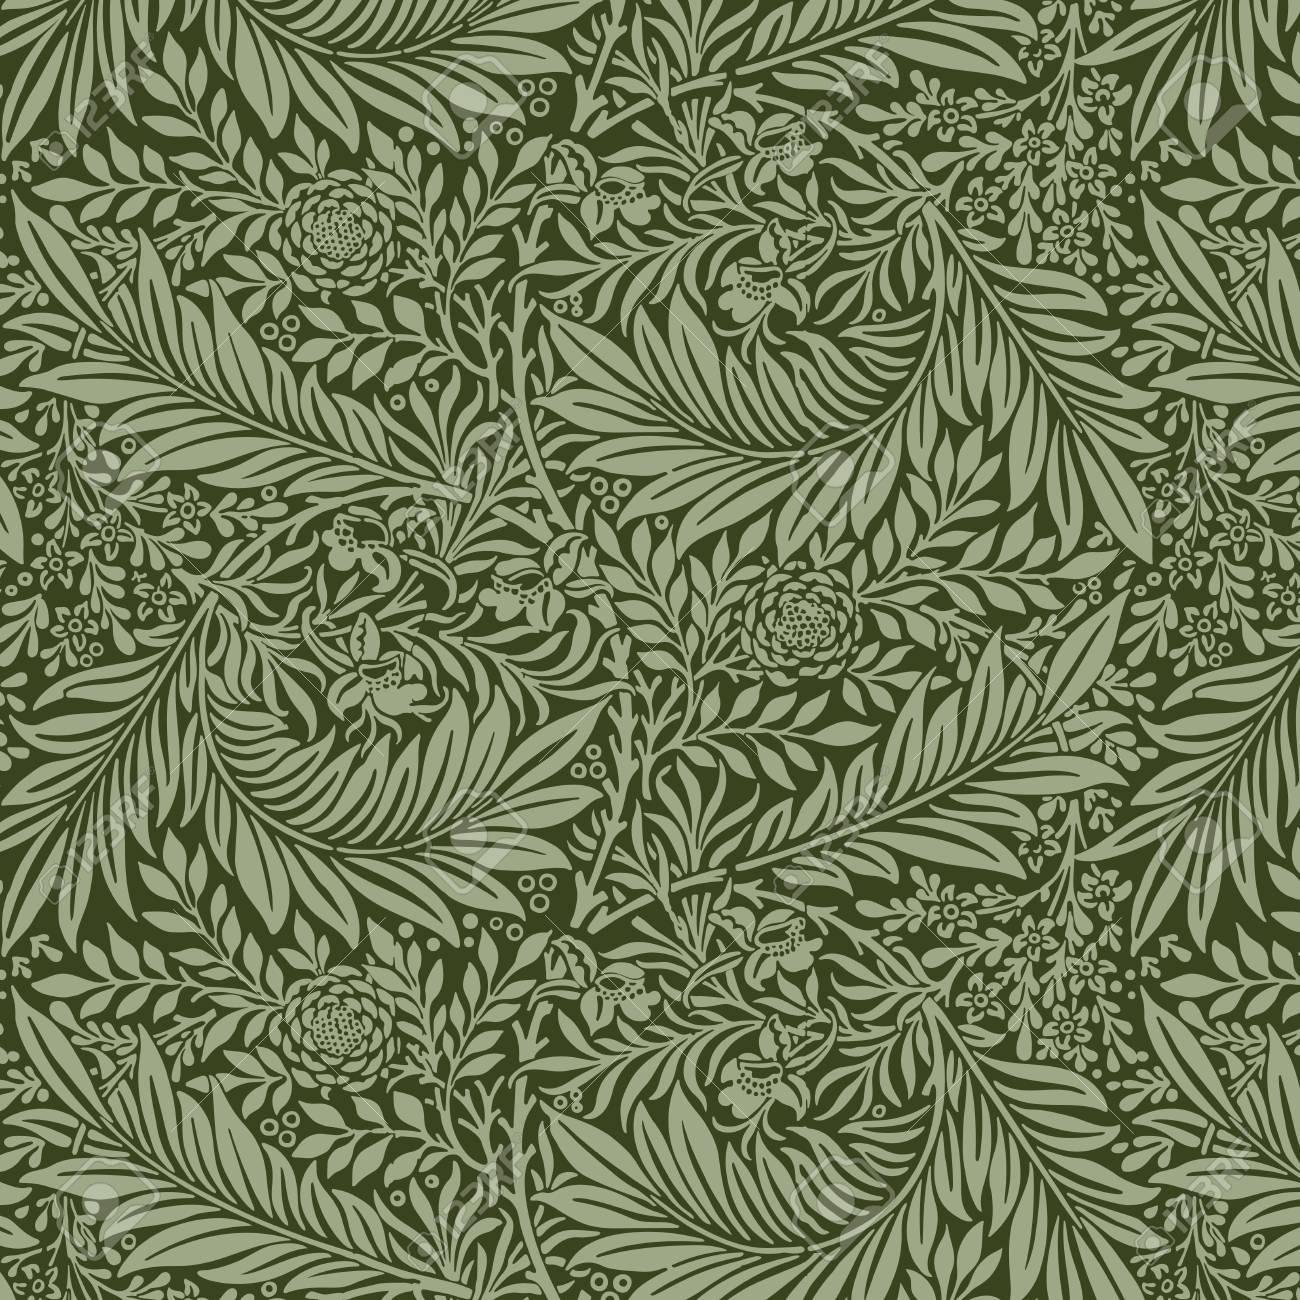 Larkspur by William Morris (1834-1896). Original from The MET Museum. Digitally enhanced by rawpixel. - 125970917